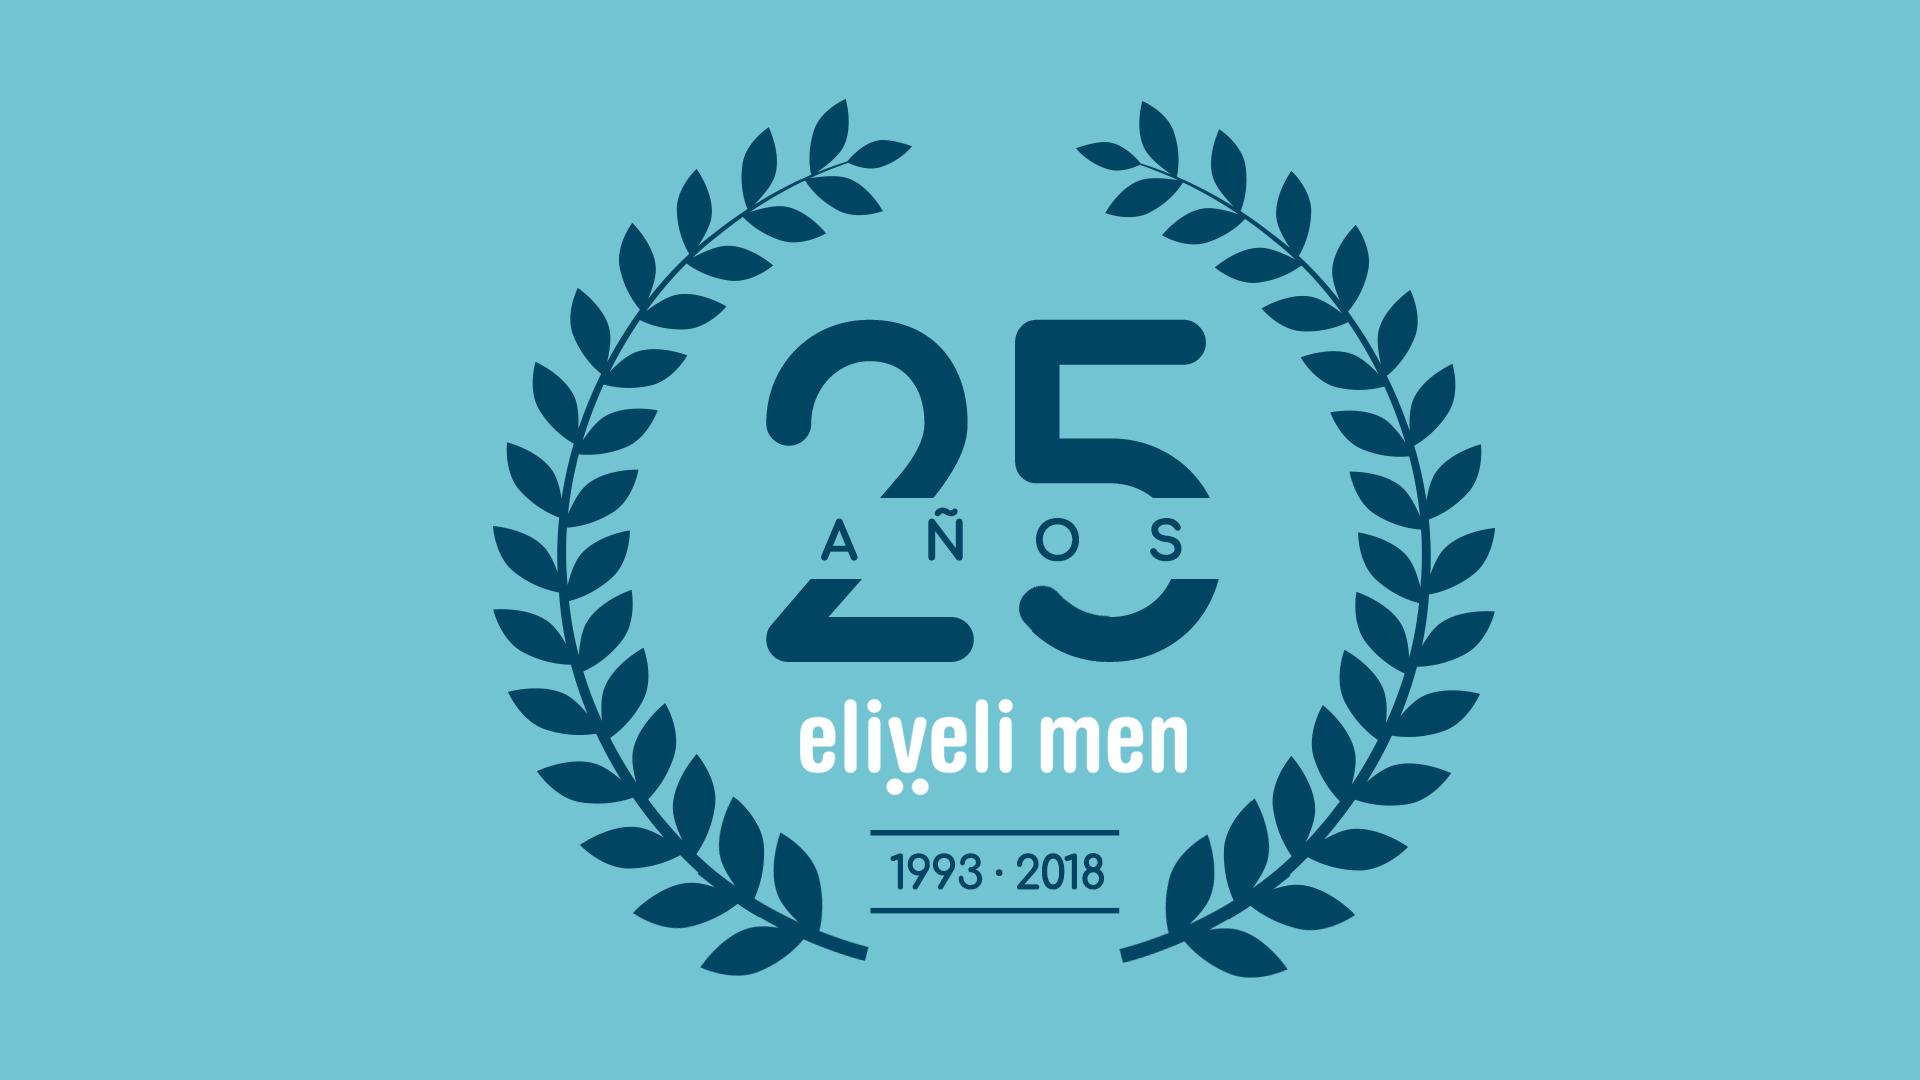 25 aniversario eliveli men